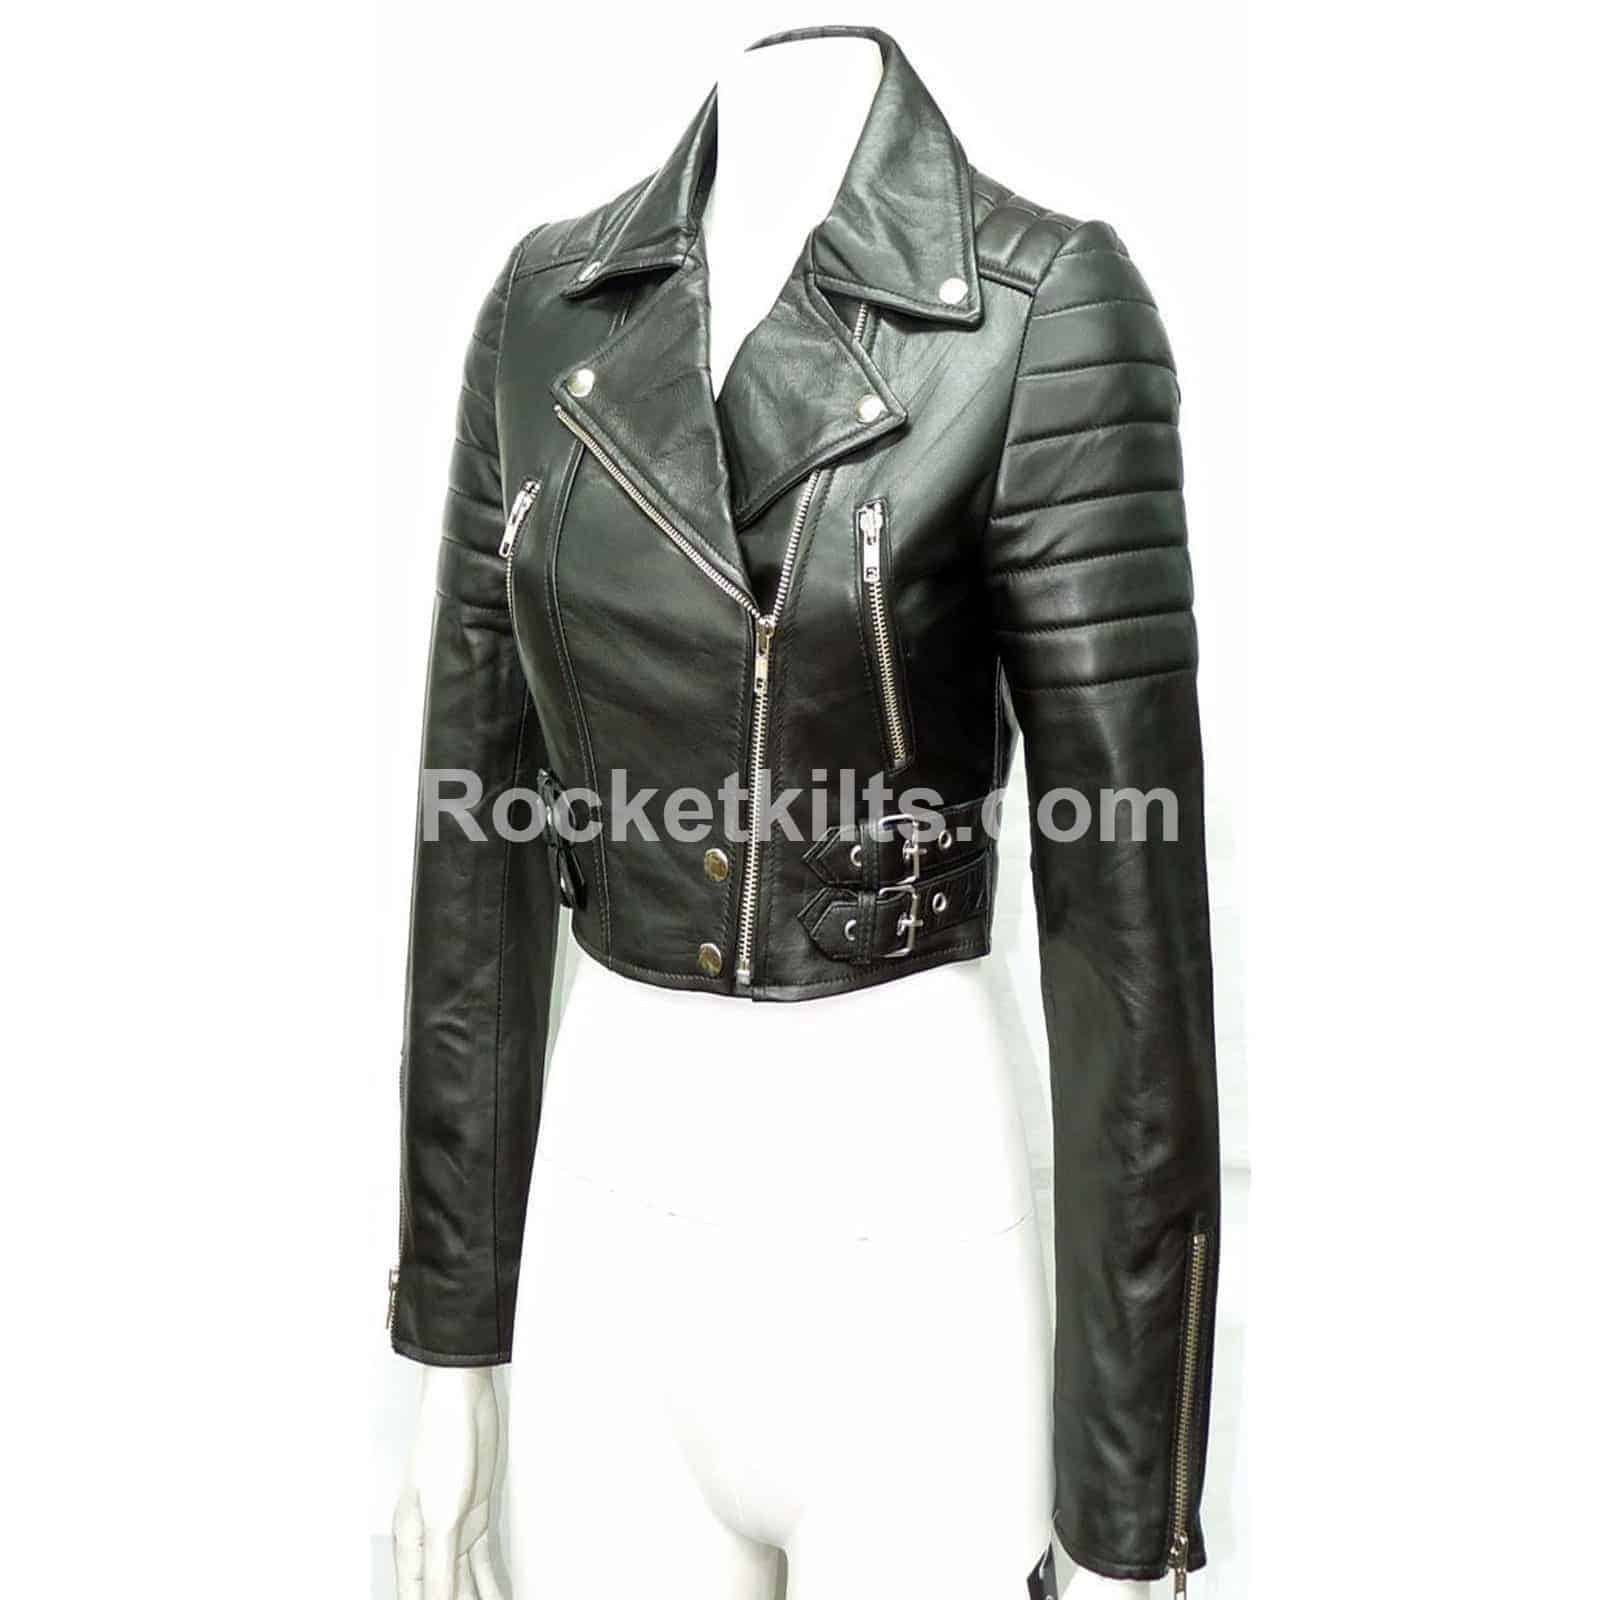 be0905977 Missy Ladies Women's Black Short Biker Cropped Leather Jacket